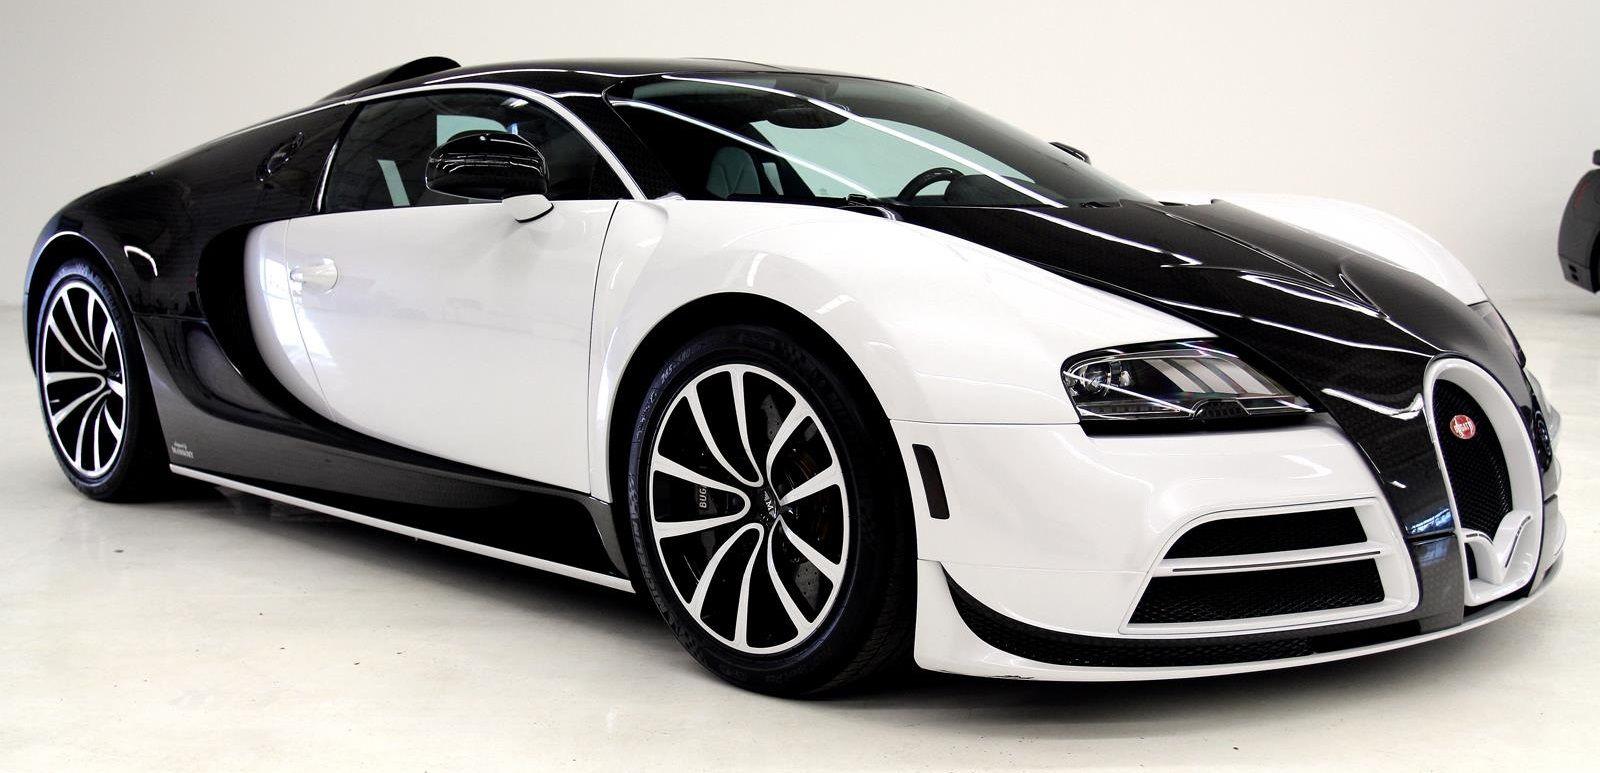 Bugatti Veyron Mansory Vivere Te Koop Voor 2 5m Op Ebay Bugatti Veyron Bugatti Cars Bugatti Veyron